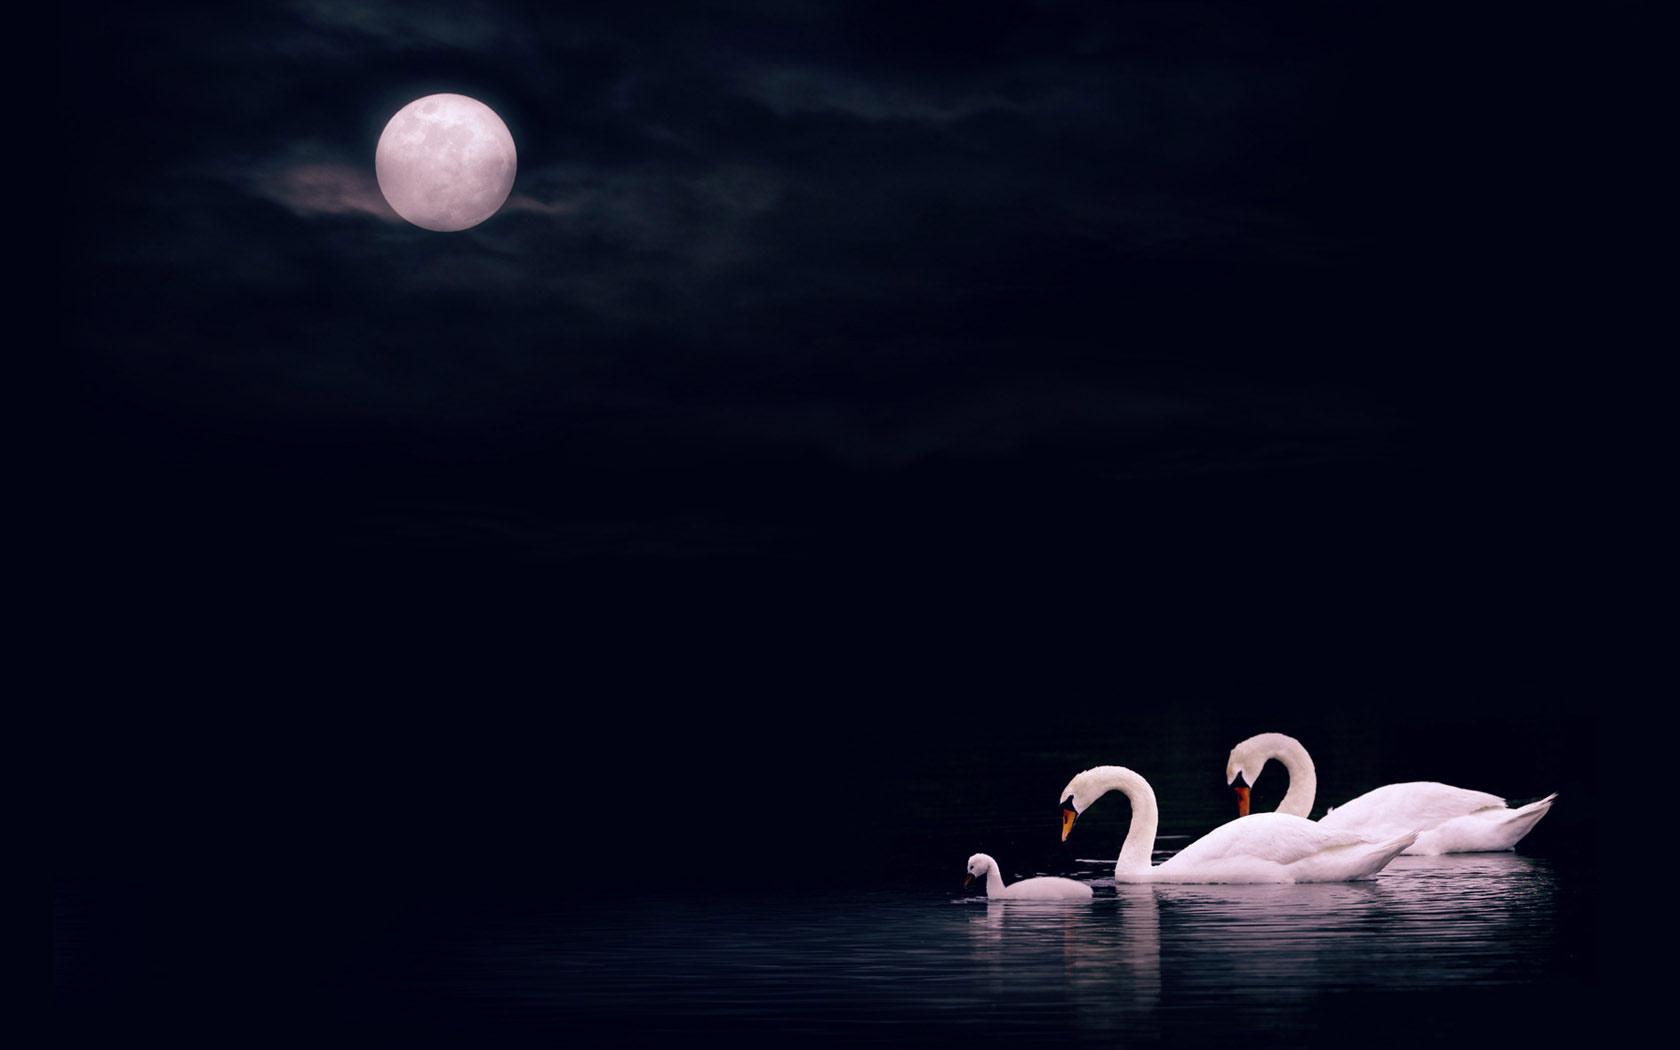 desktop background Swan lake photography wallpaper Animal Wallpapers 1680x1050